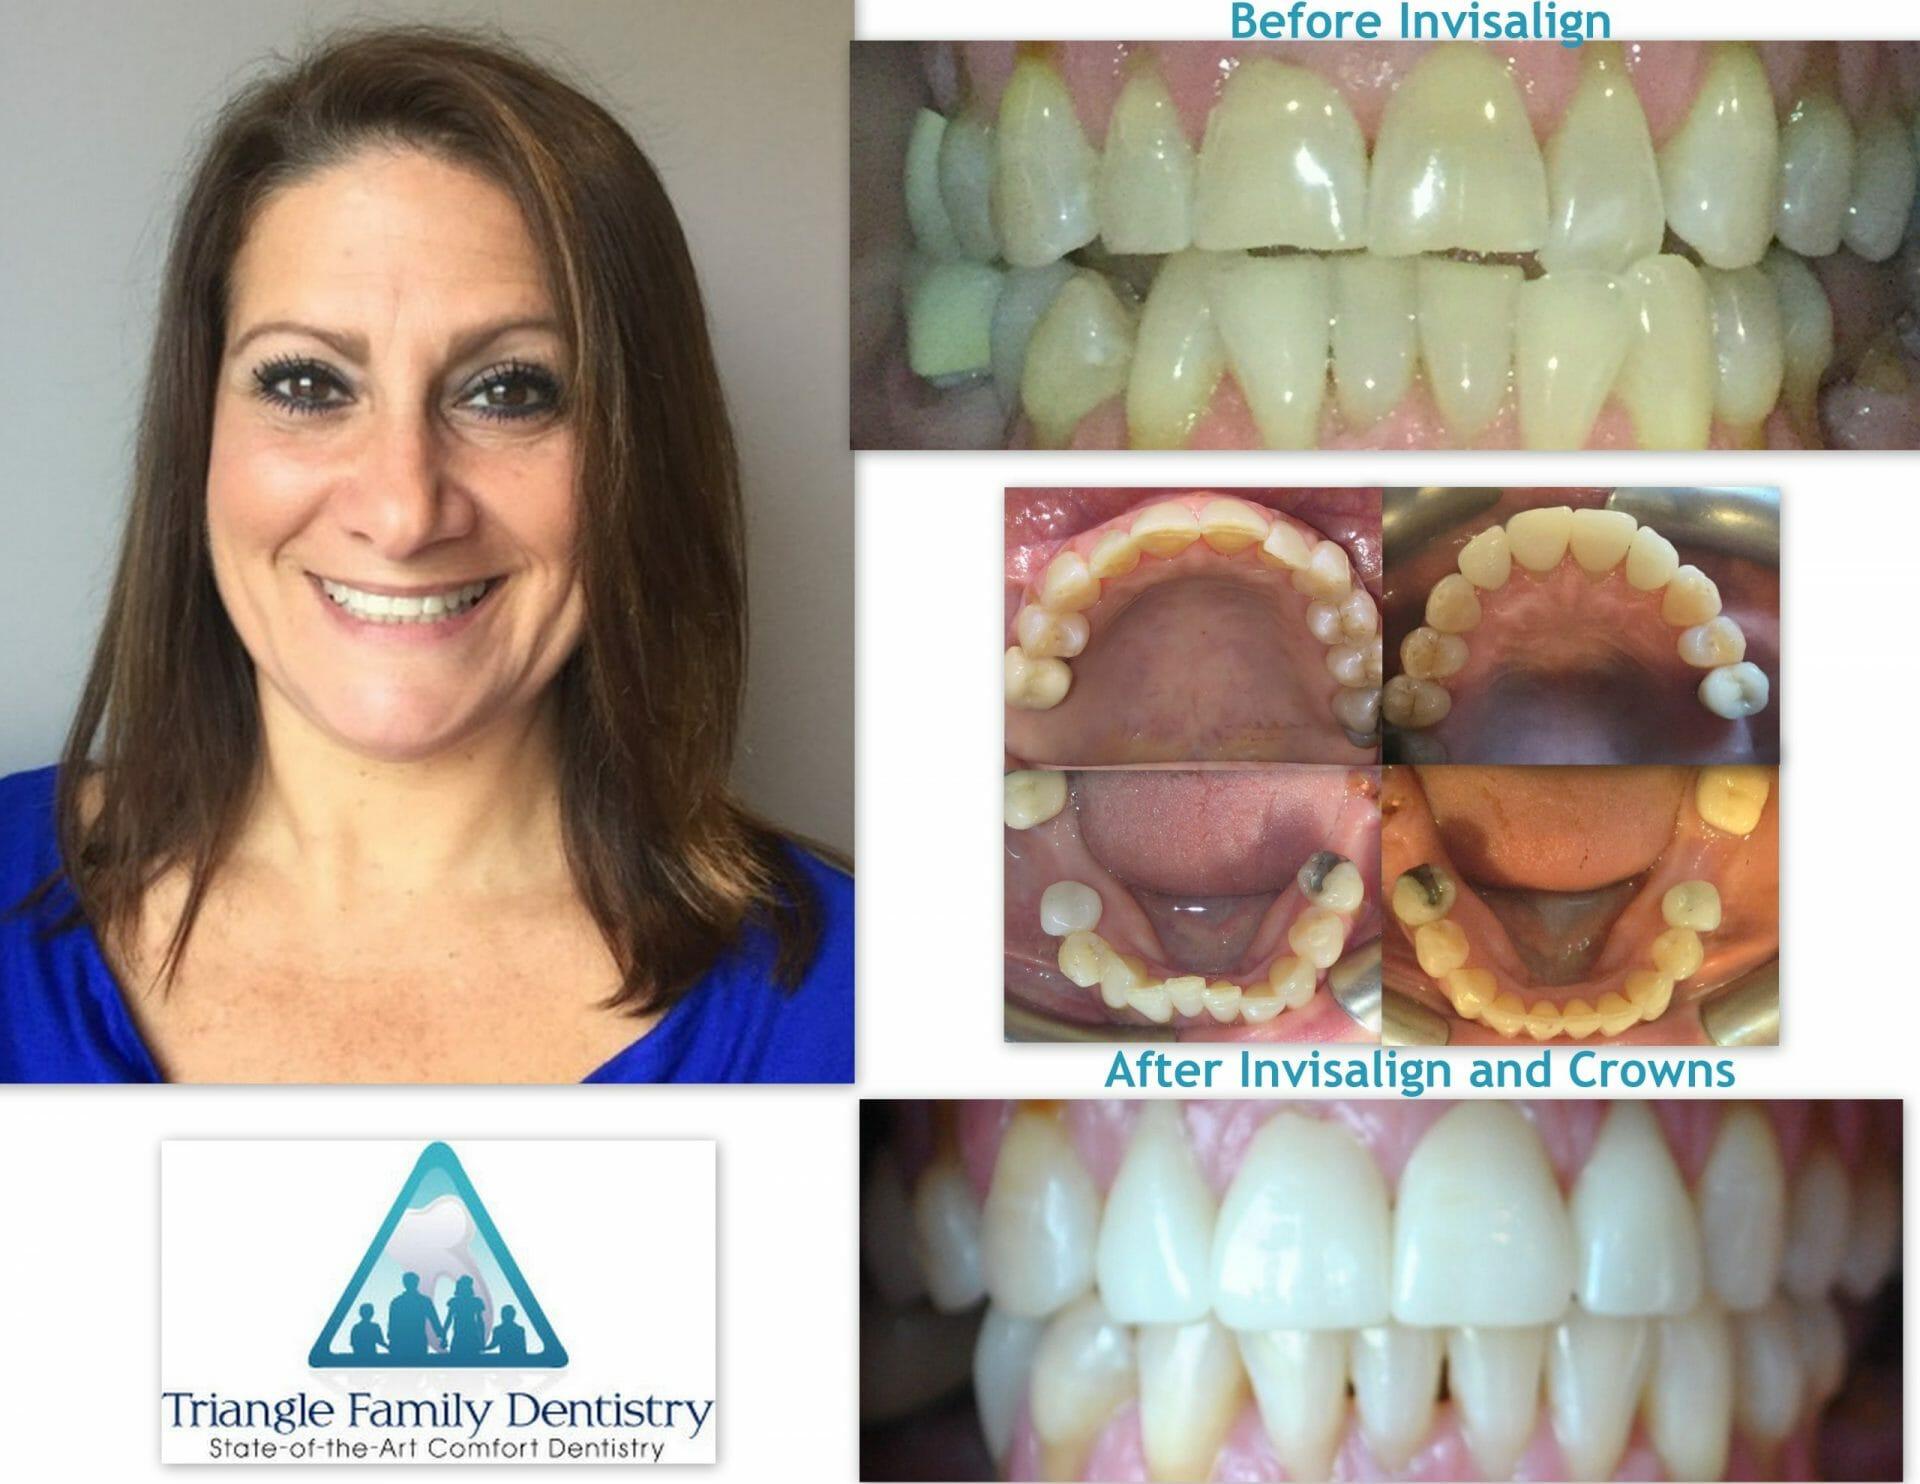 morrisville-dentist-invisalign-before-after-Sep2019